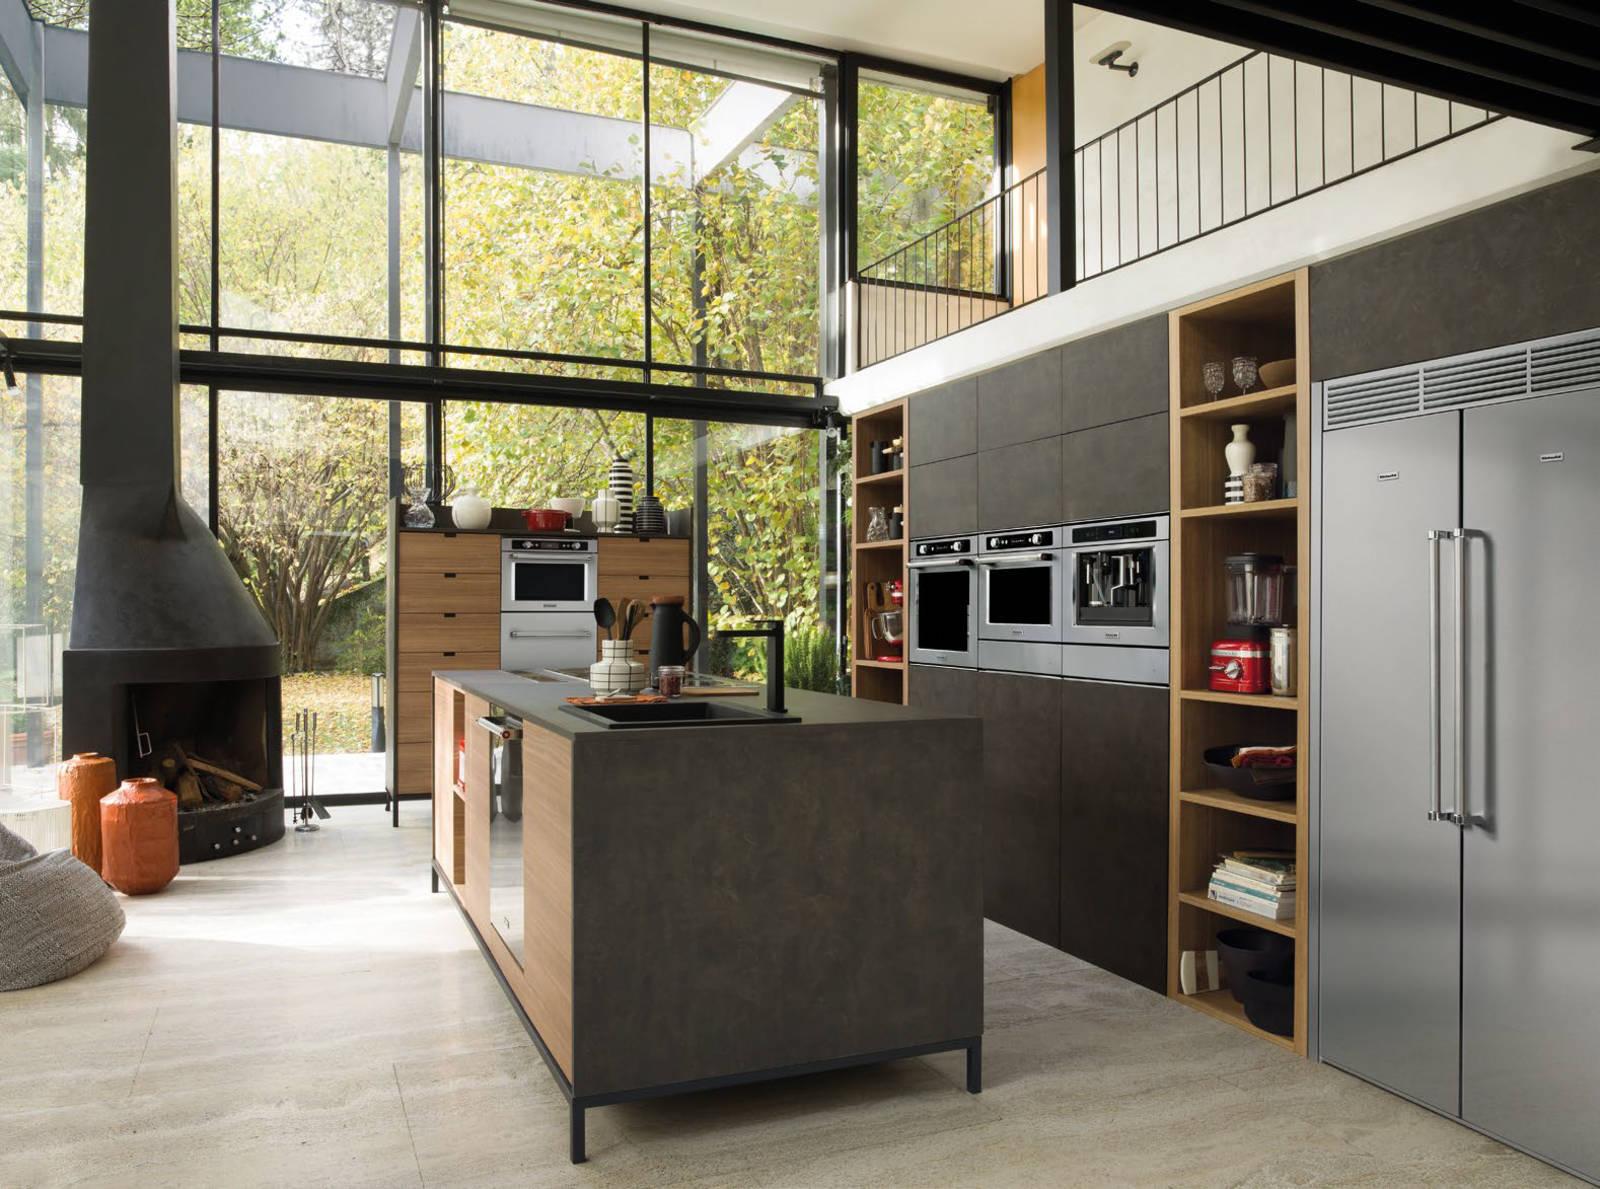 industrial style k che k che schwarz wei wandfarbe m lltrenner lackieren nolte weiss grifflos. Black Bedroom Furniture Sets. Home Design Ideas